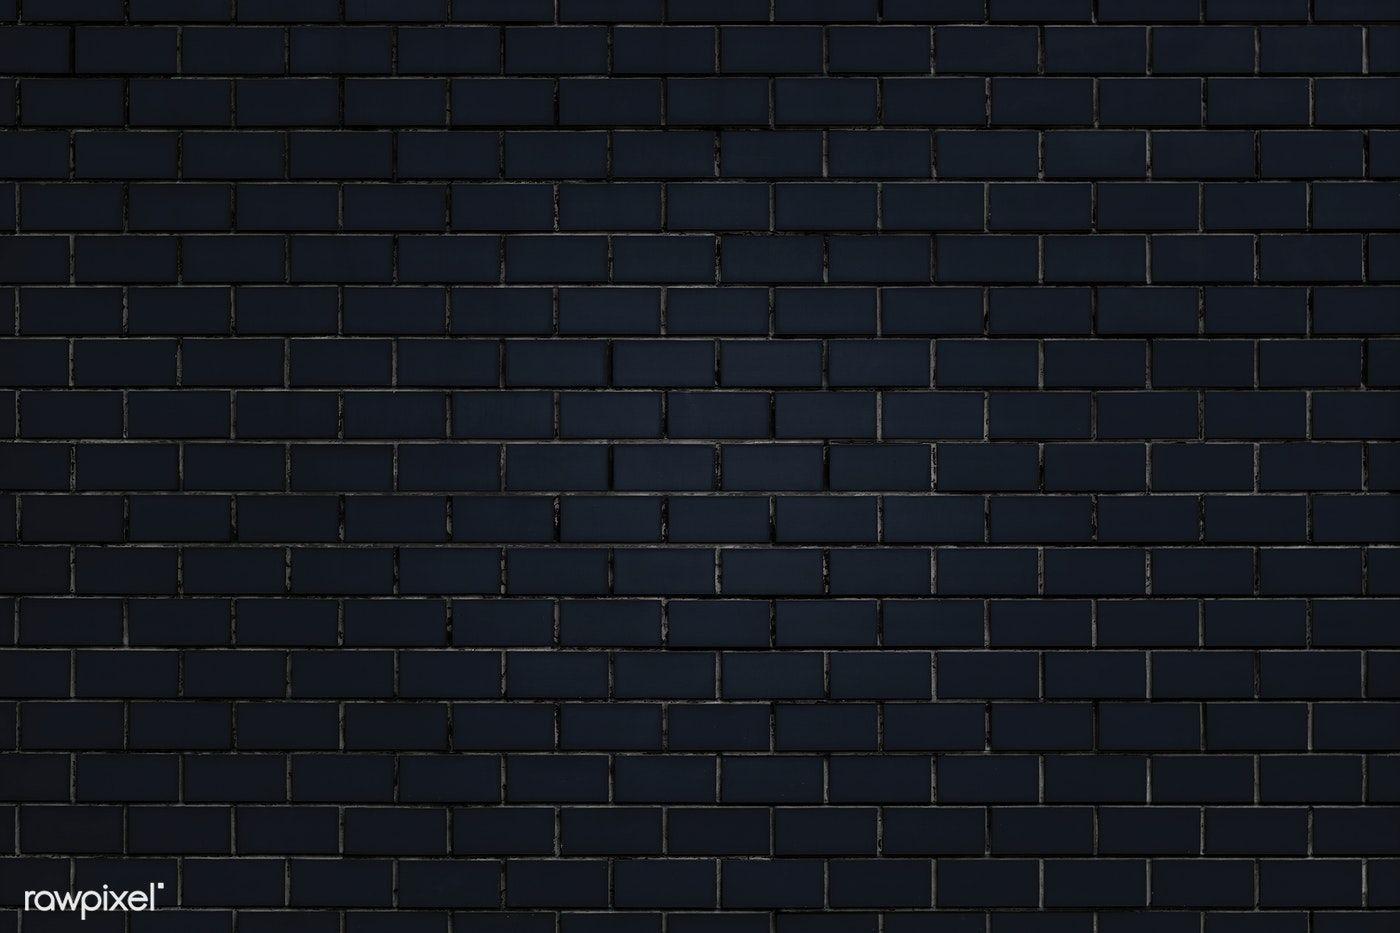 Black Free Image By Rawpixel Com Ake Chim Black Brick Wall Black Brick Brick Wall